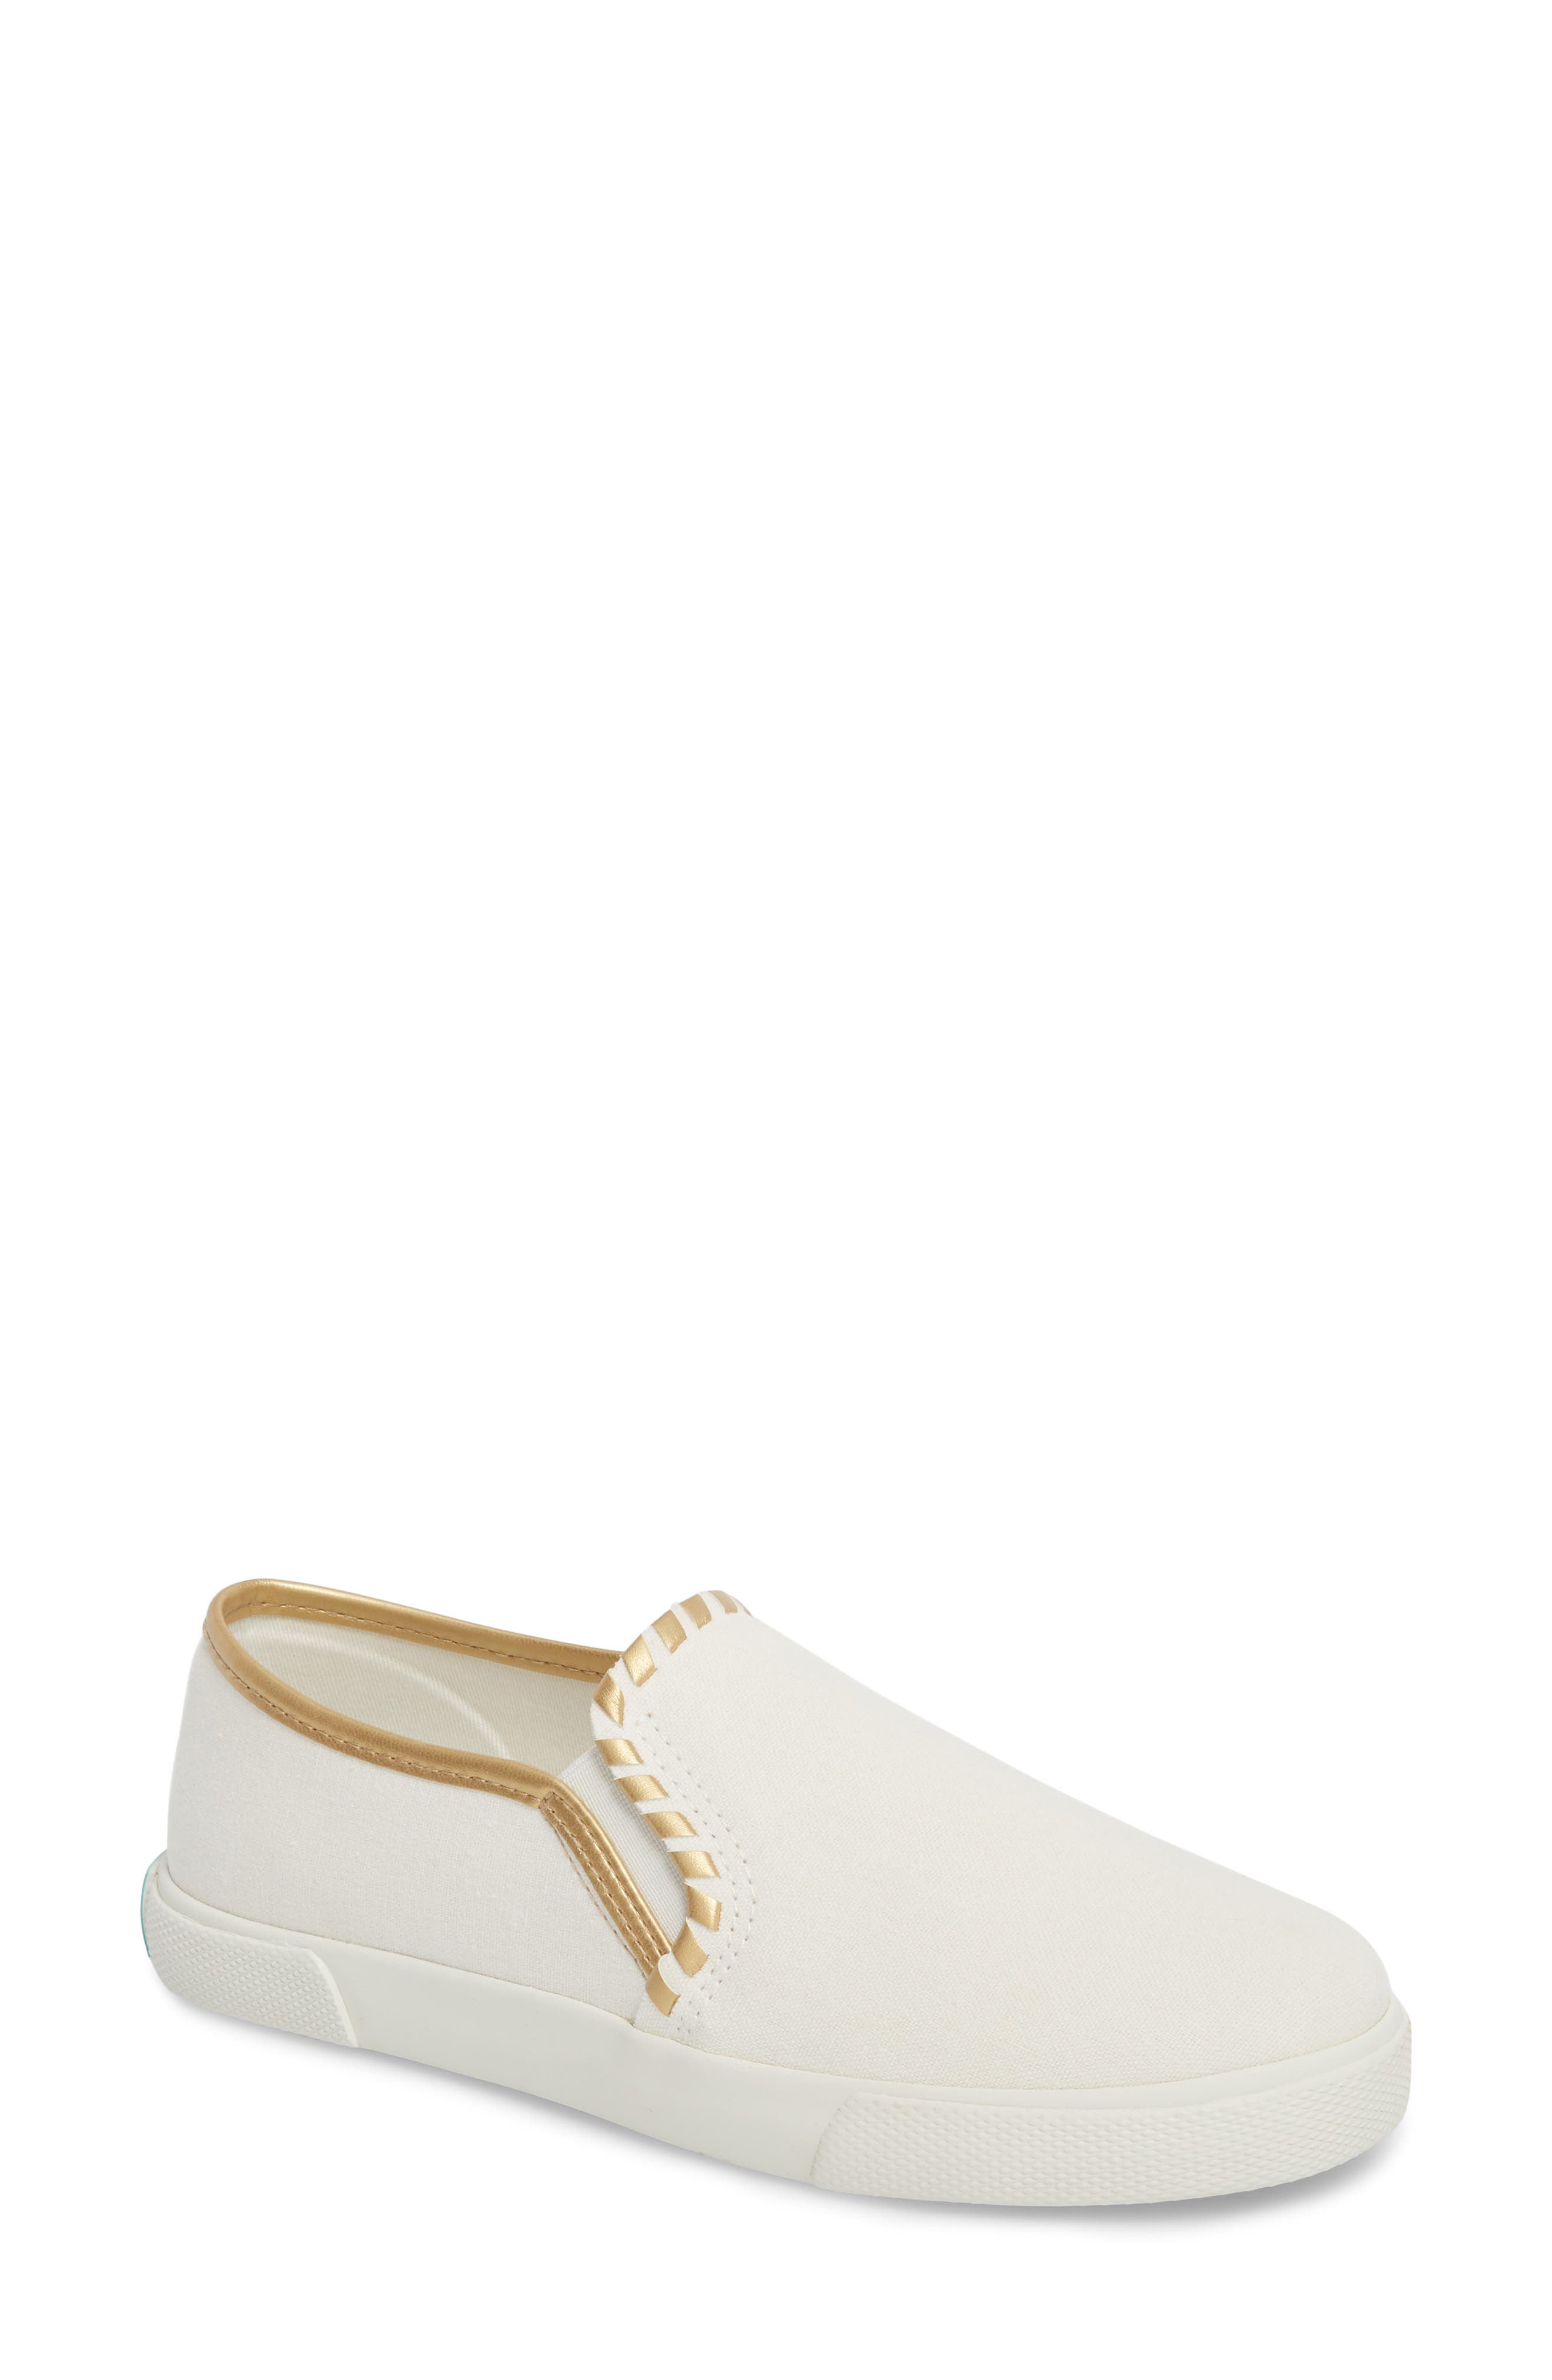 McKay Slip-On Sneaker,                             Main thumbnail 1, color,                             WHITE FABRIC